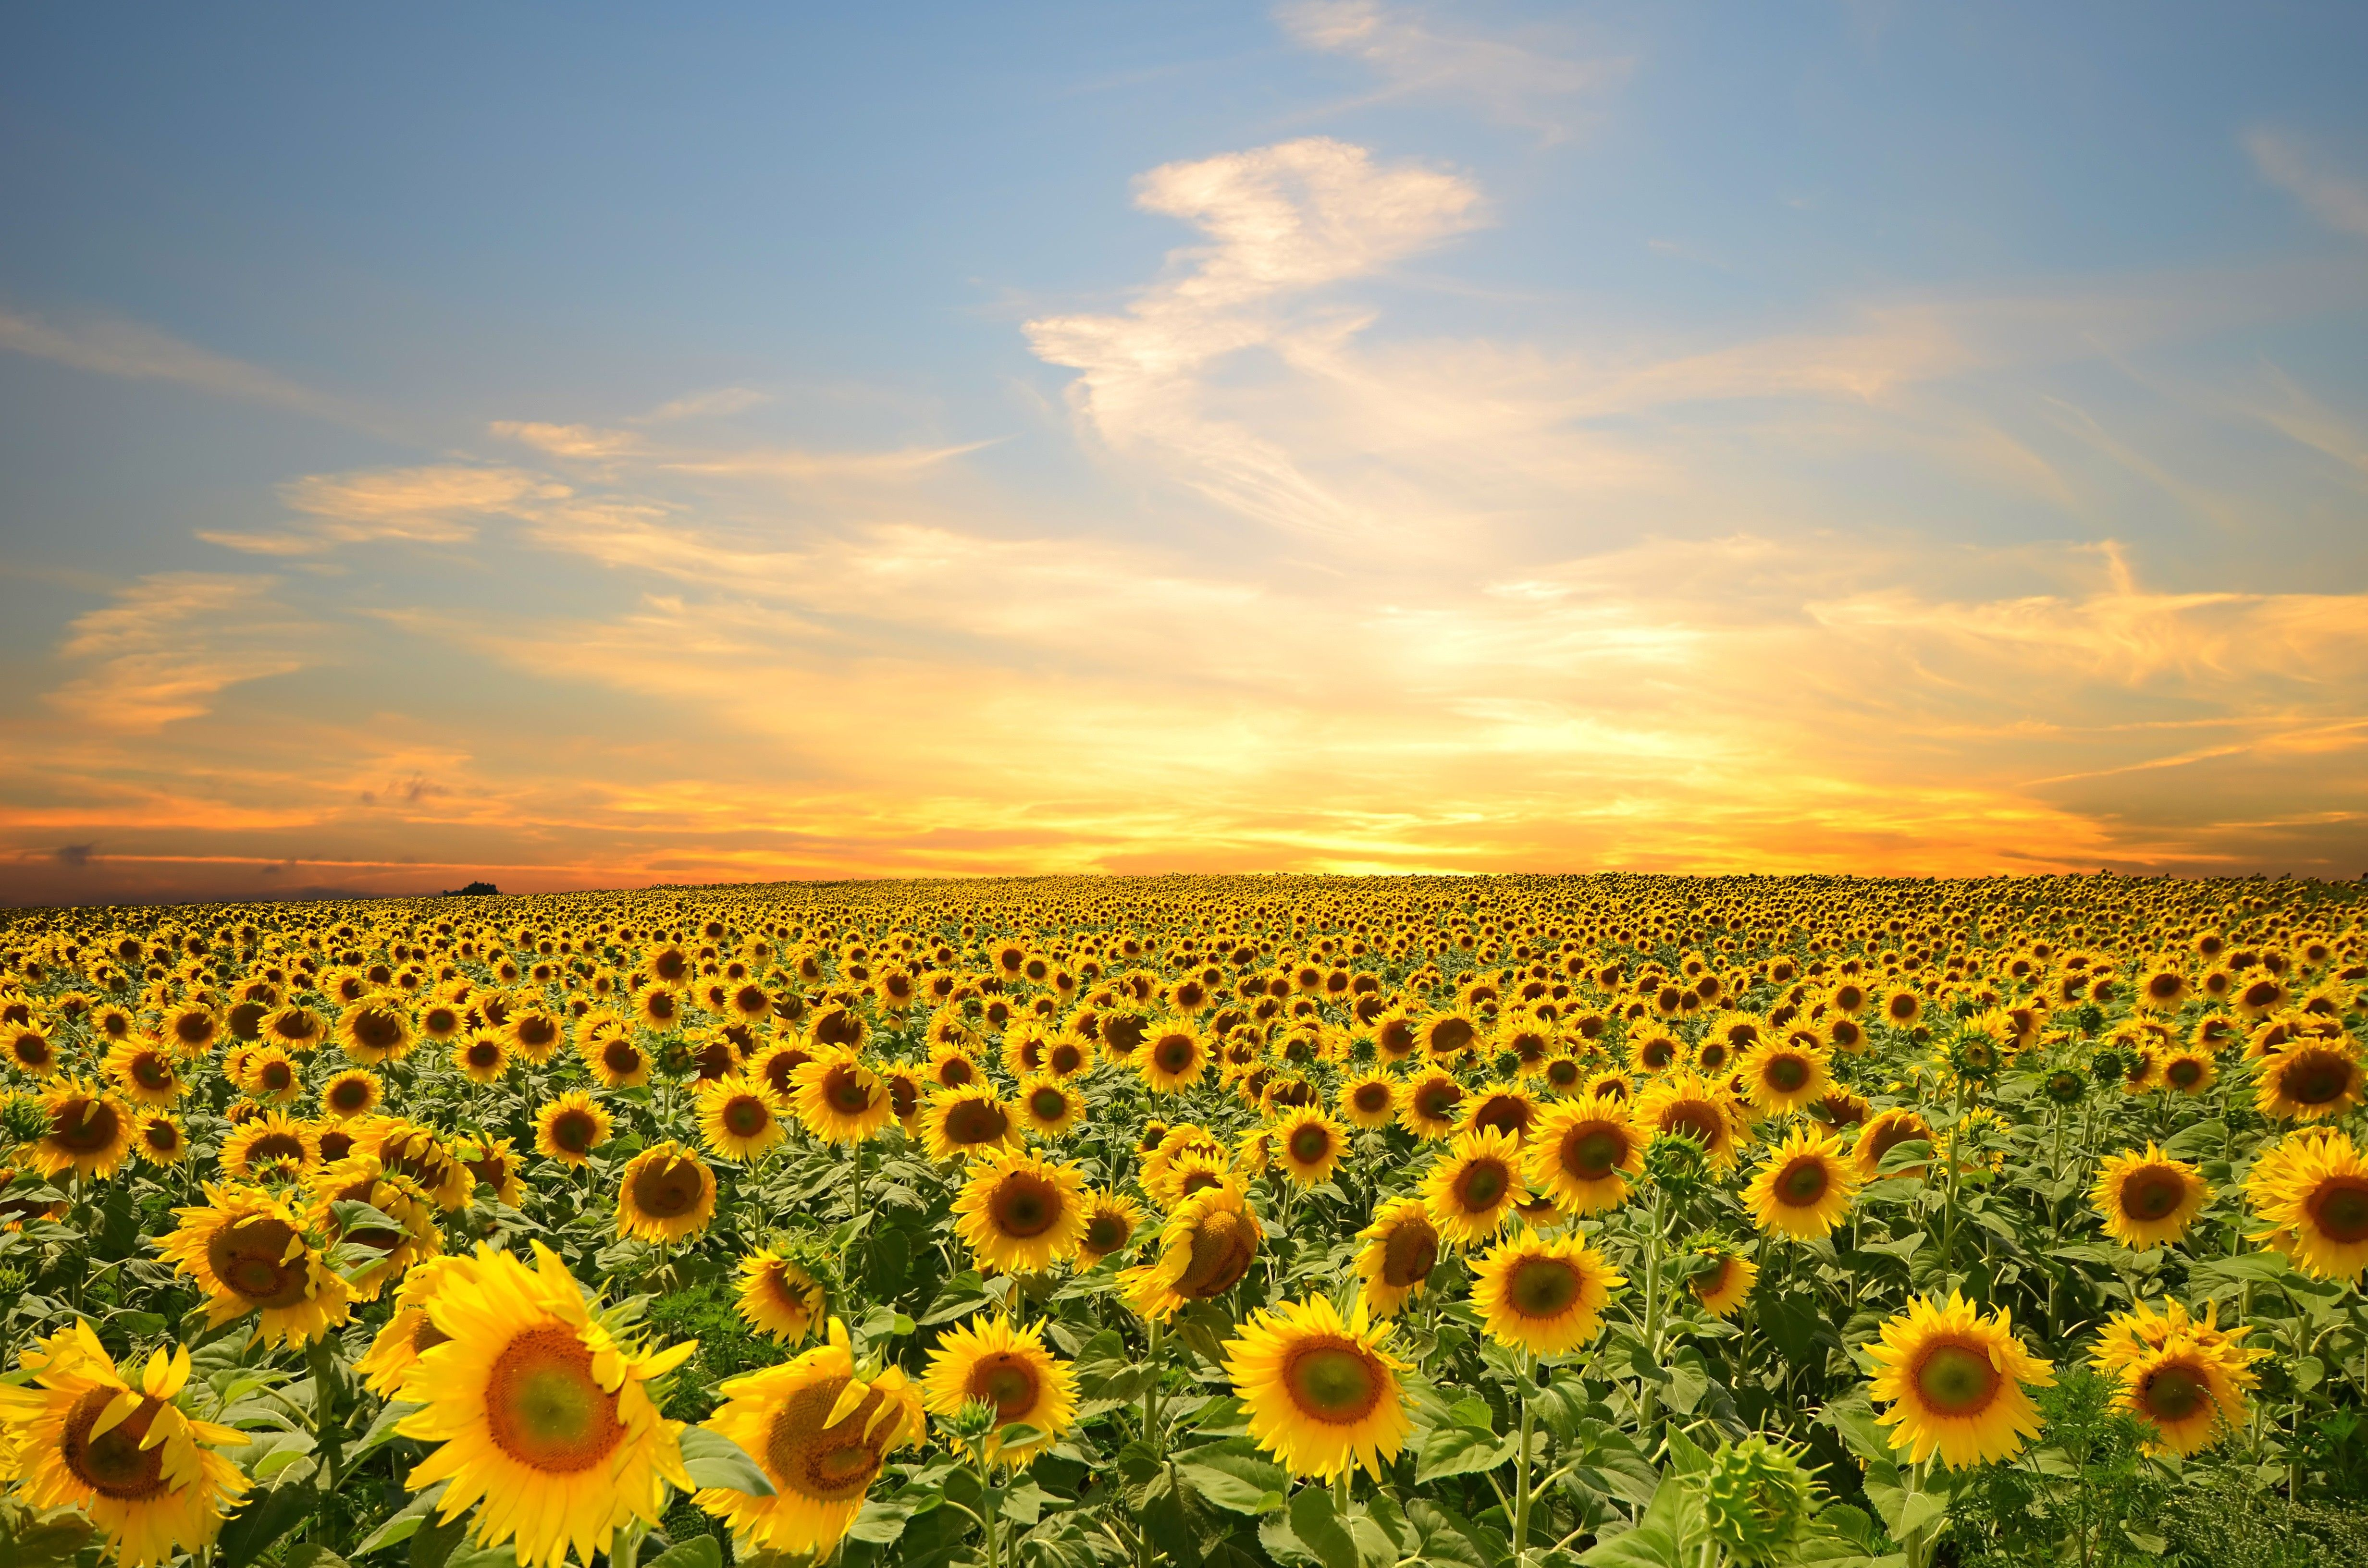 Sunflowers Flowers Sunset Sky Splendor Petals Nature Field Clouds 4928x3264